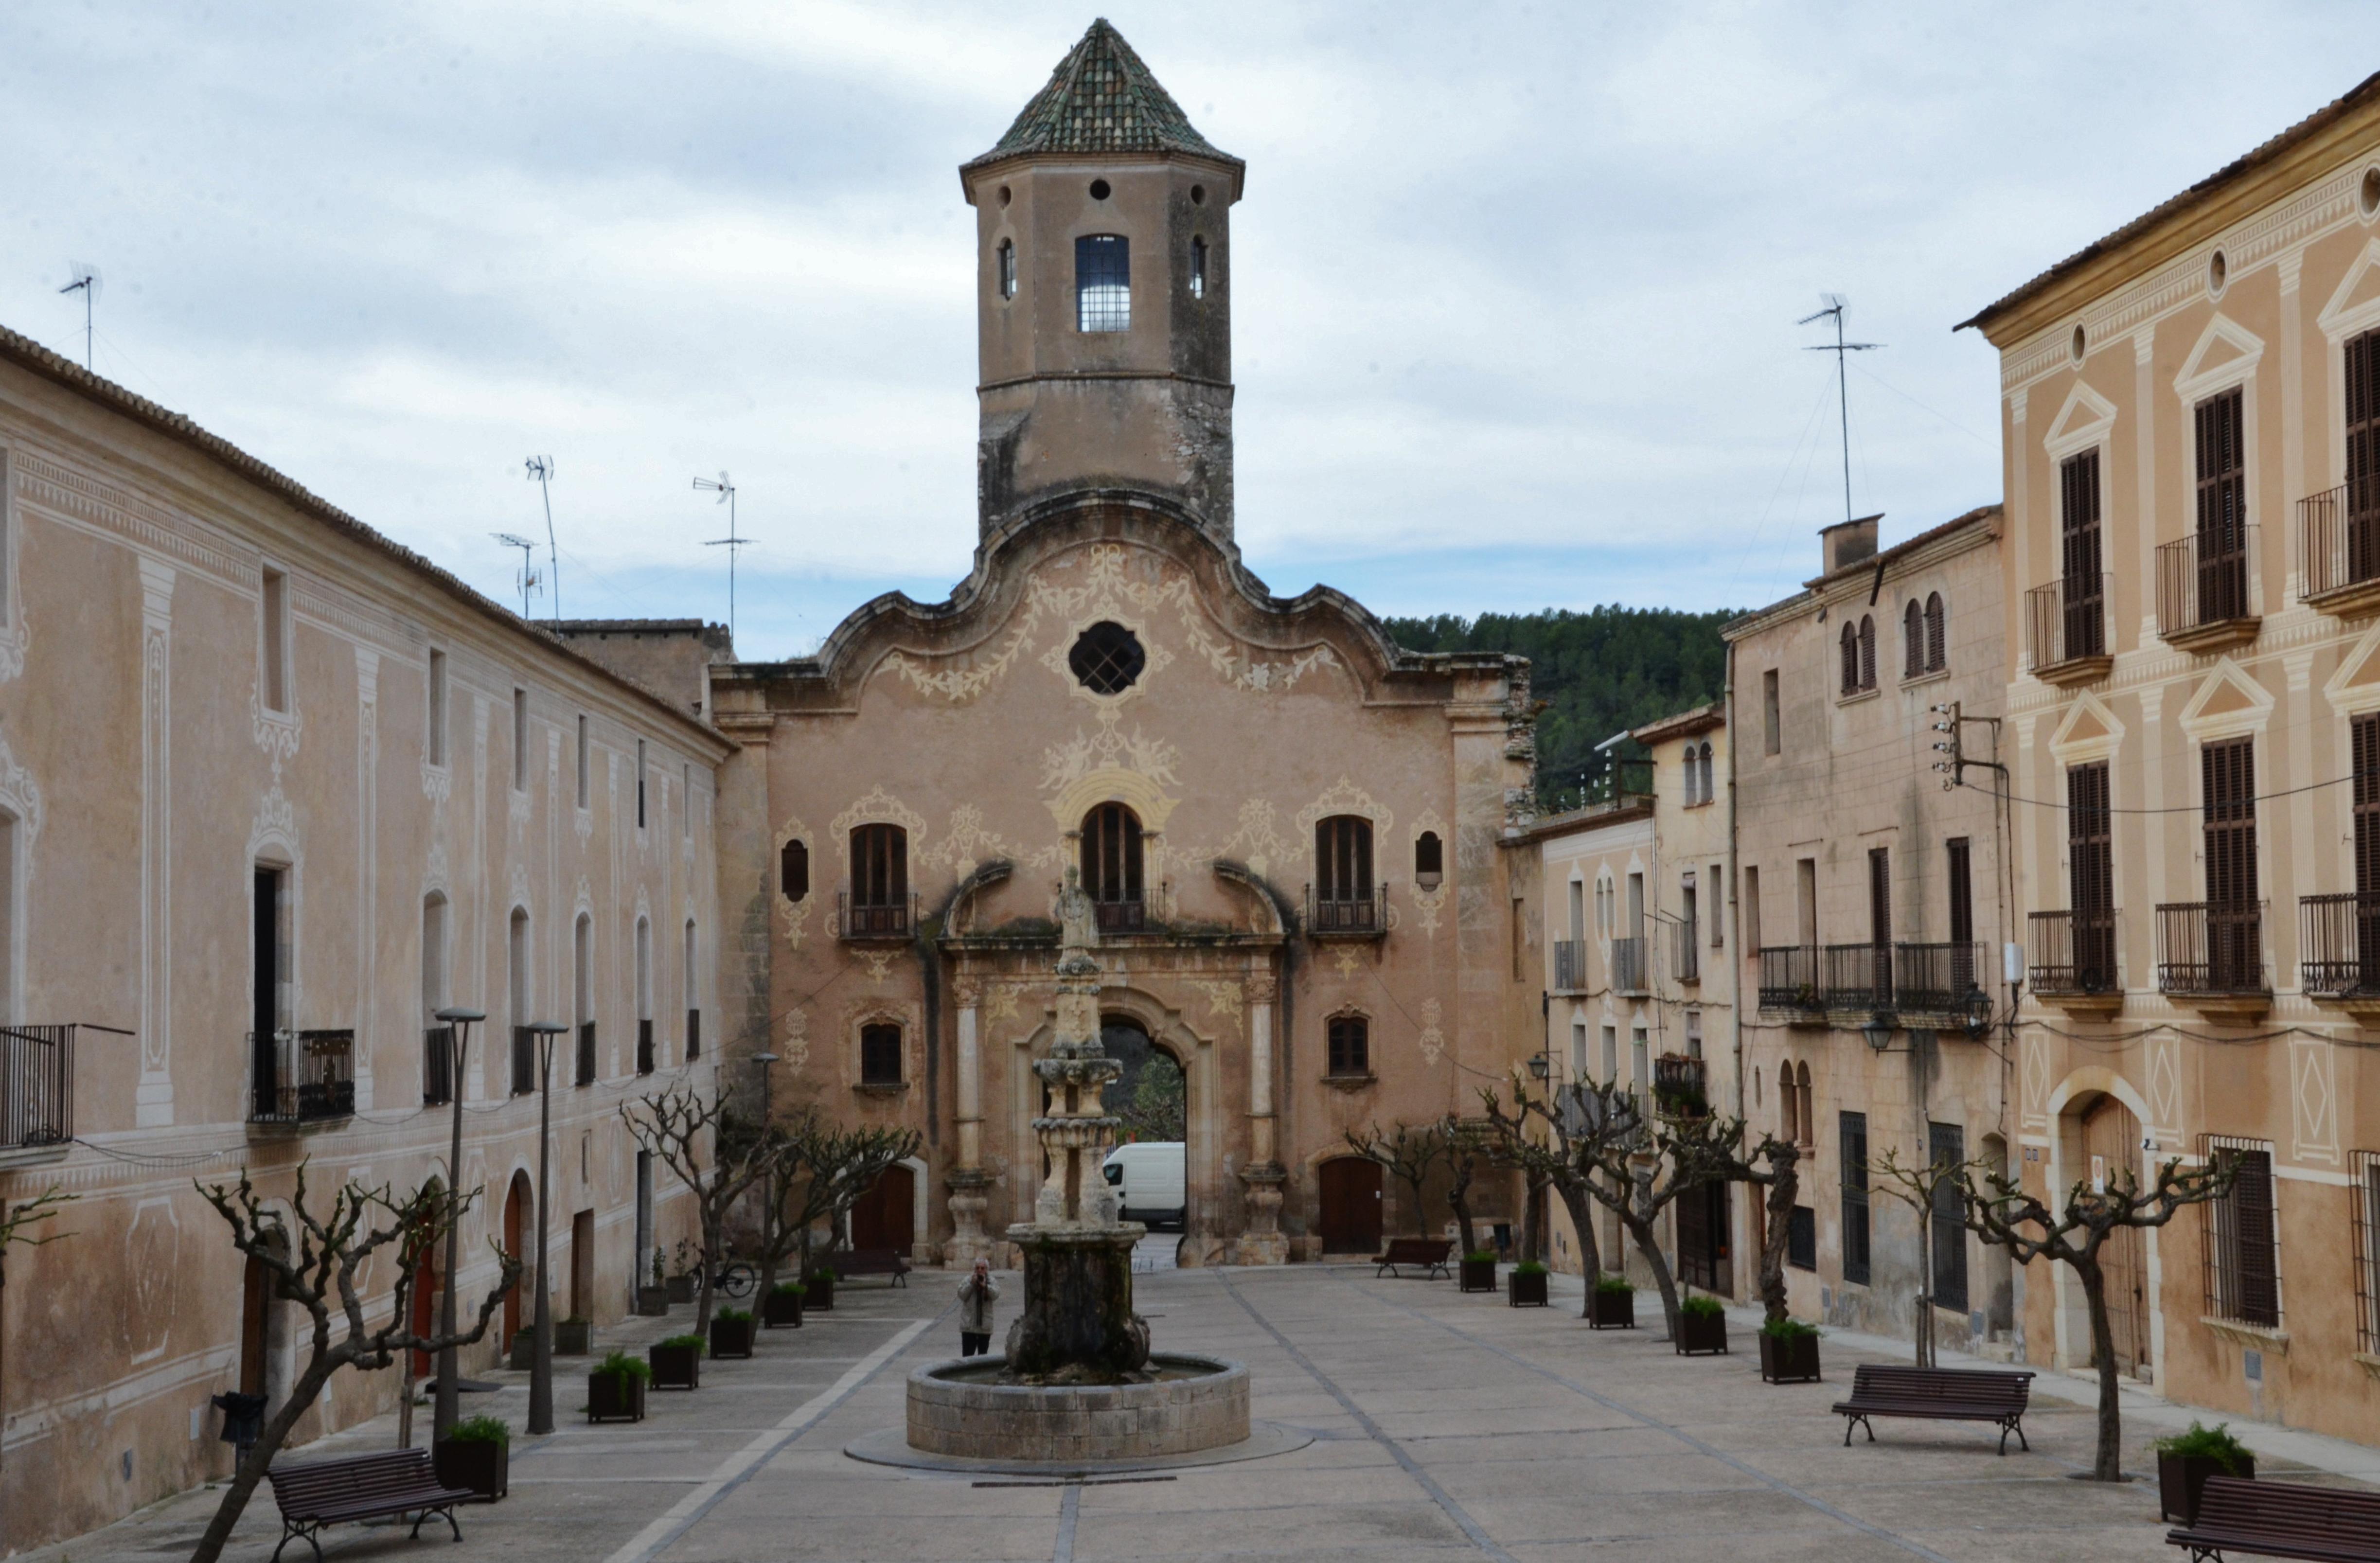 File:WLM14ES - Plaça del Reial Monestir de Santes Creus, Aiguamurcia, Alt Cam...